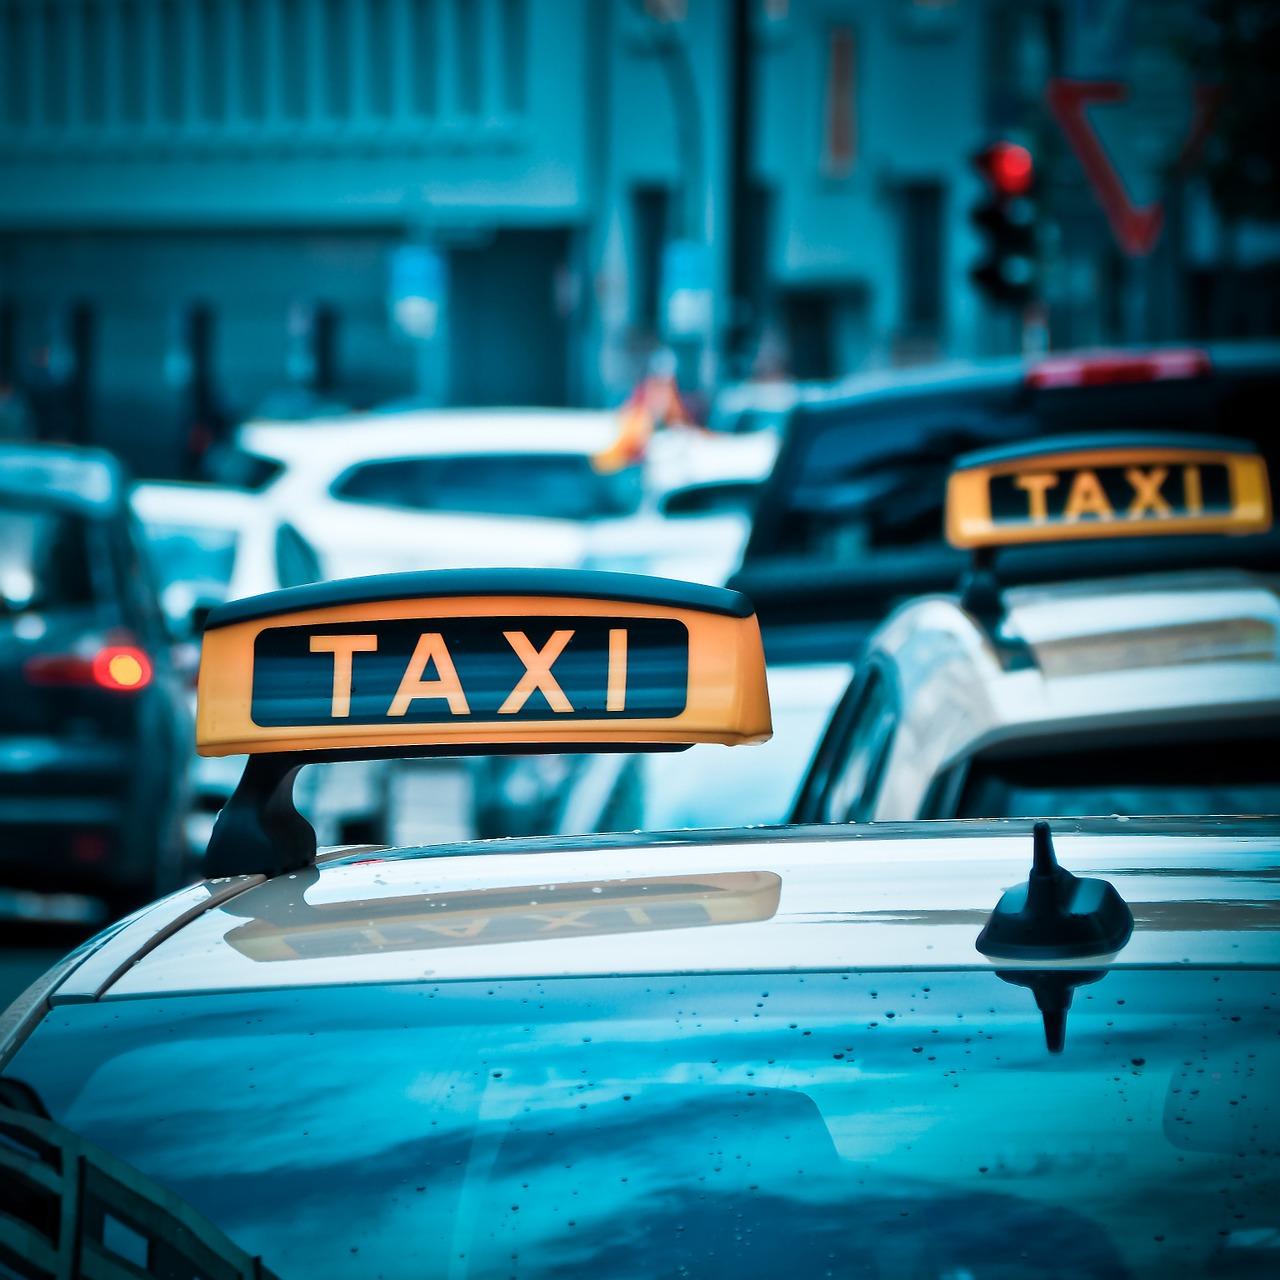 preturi taxi romania